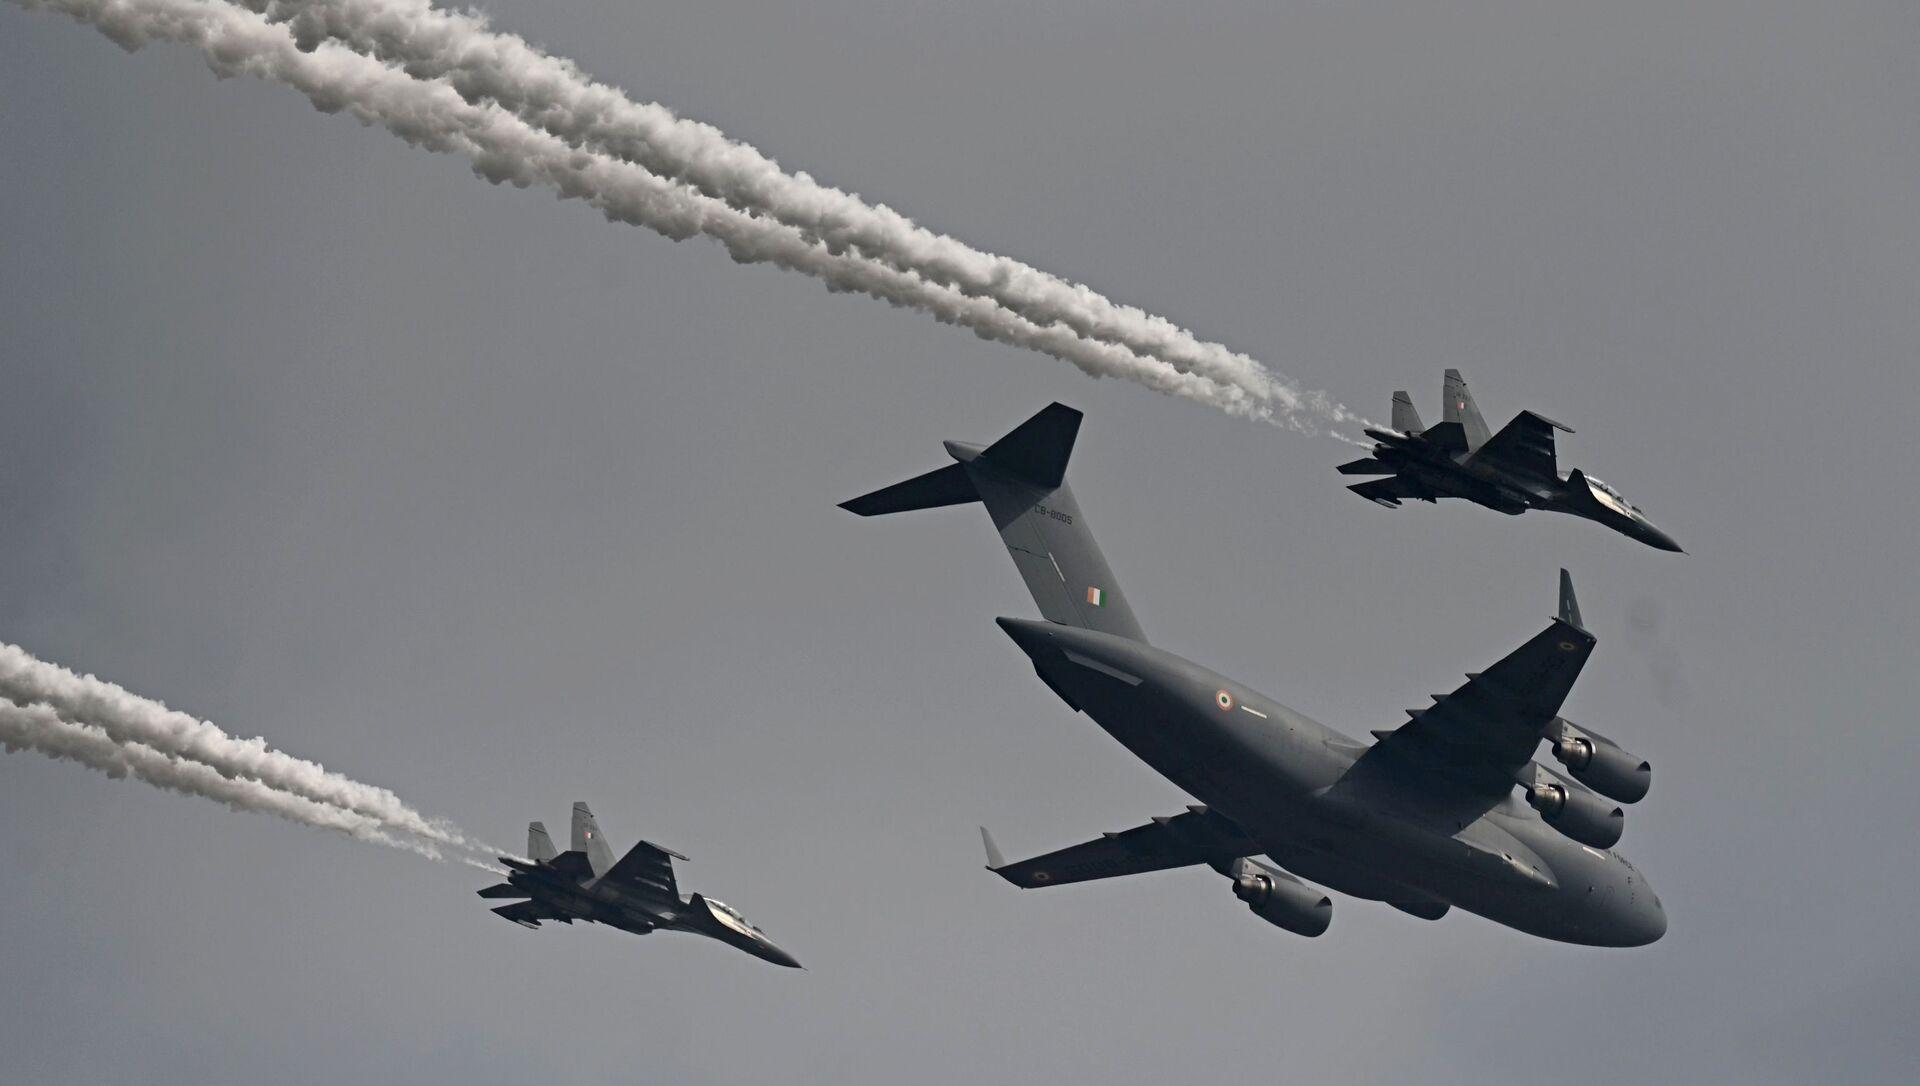 Letouny indického letectva C-17 Globemaster (C) spolu s stíhačkami Su-30MKI v první den letecké show Aero India 2021 - Sputnik Česká republika, 1920, 07.02.2021